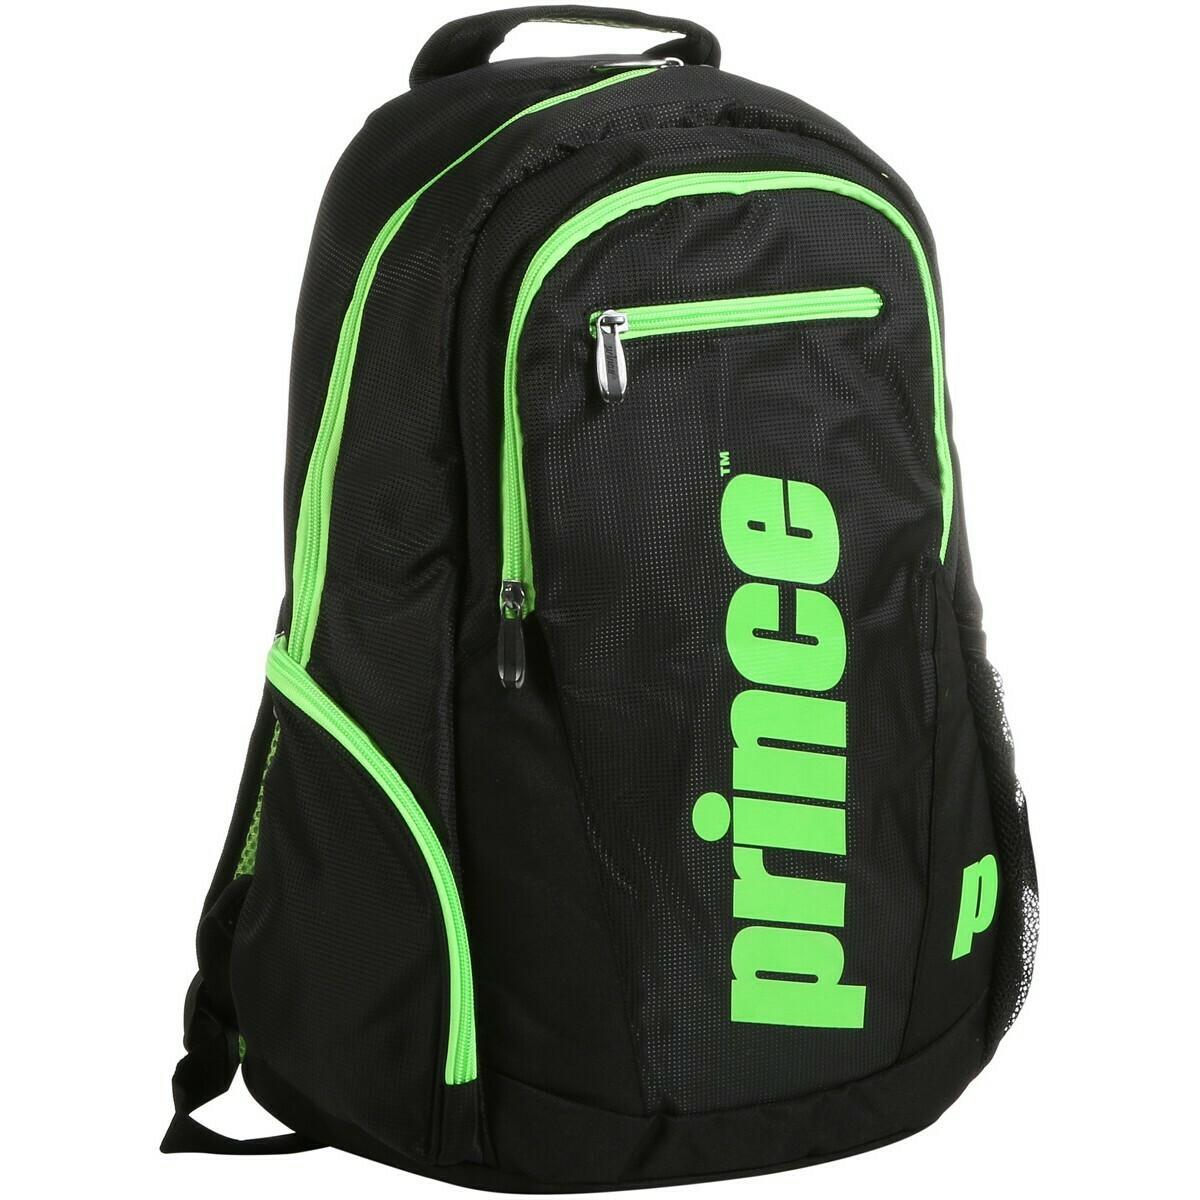 Prince Backpack - Black/Green